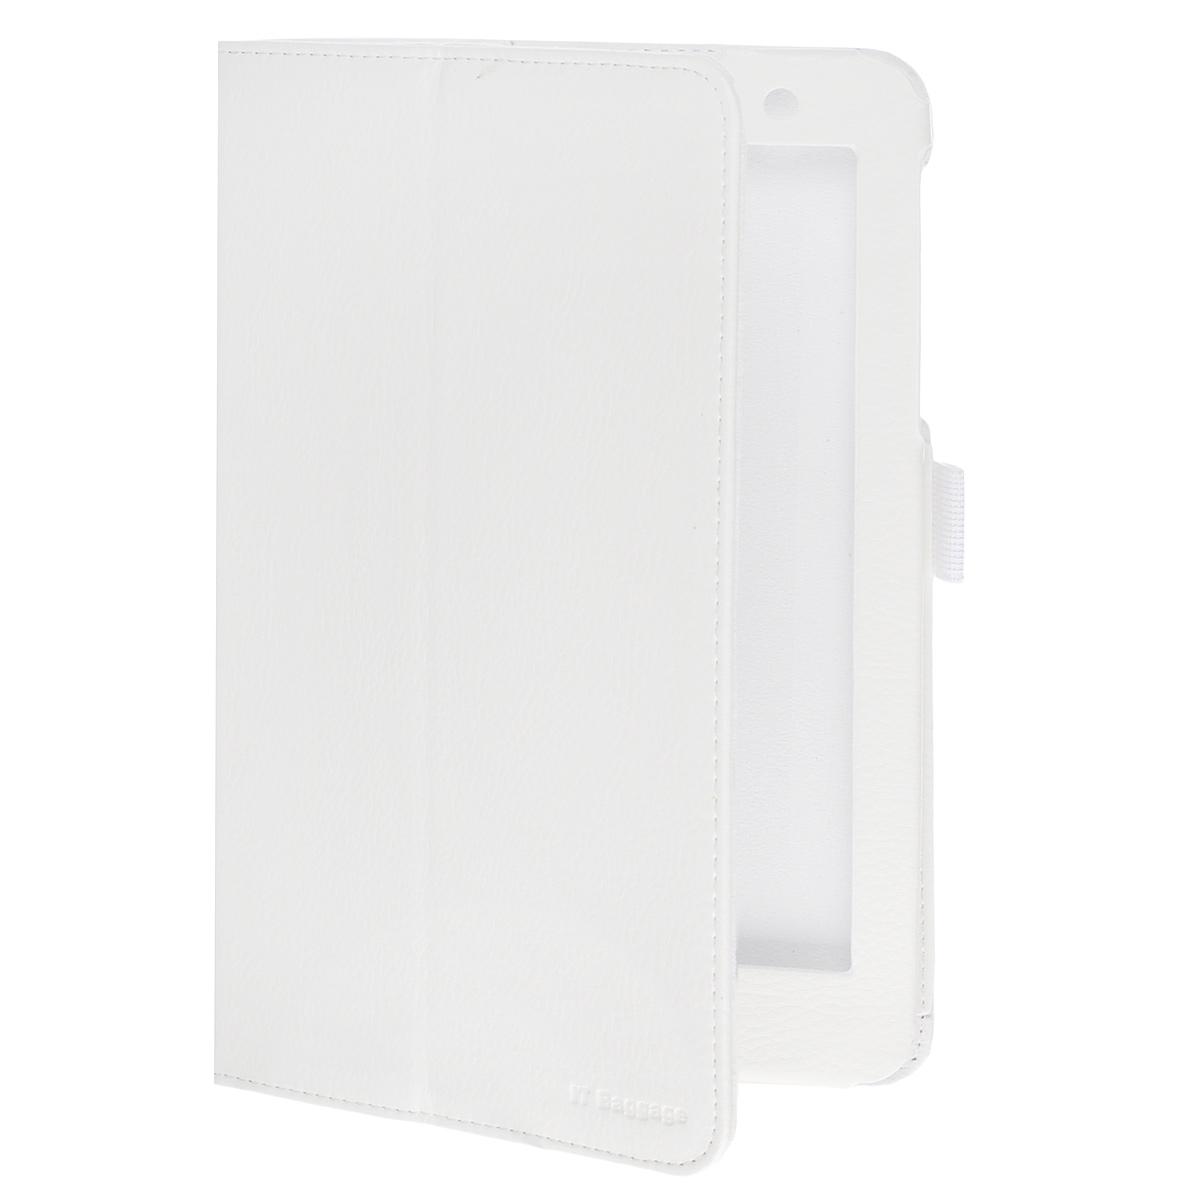 IT Baggage чехол для Lenovo Idea Tab 8 A8-50 (A5500), White for lenovo tab a8 a5500 case print pu cover case for lenovo tab a8 a5500 a8 50 a5500 h a5500 f 8inch tablet case stylus pen